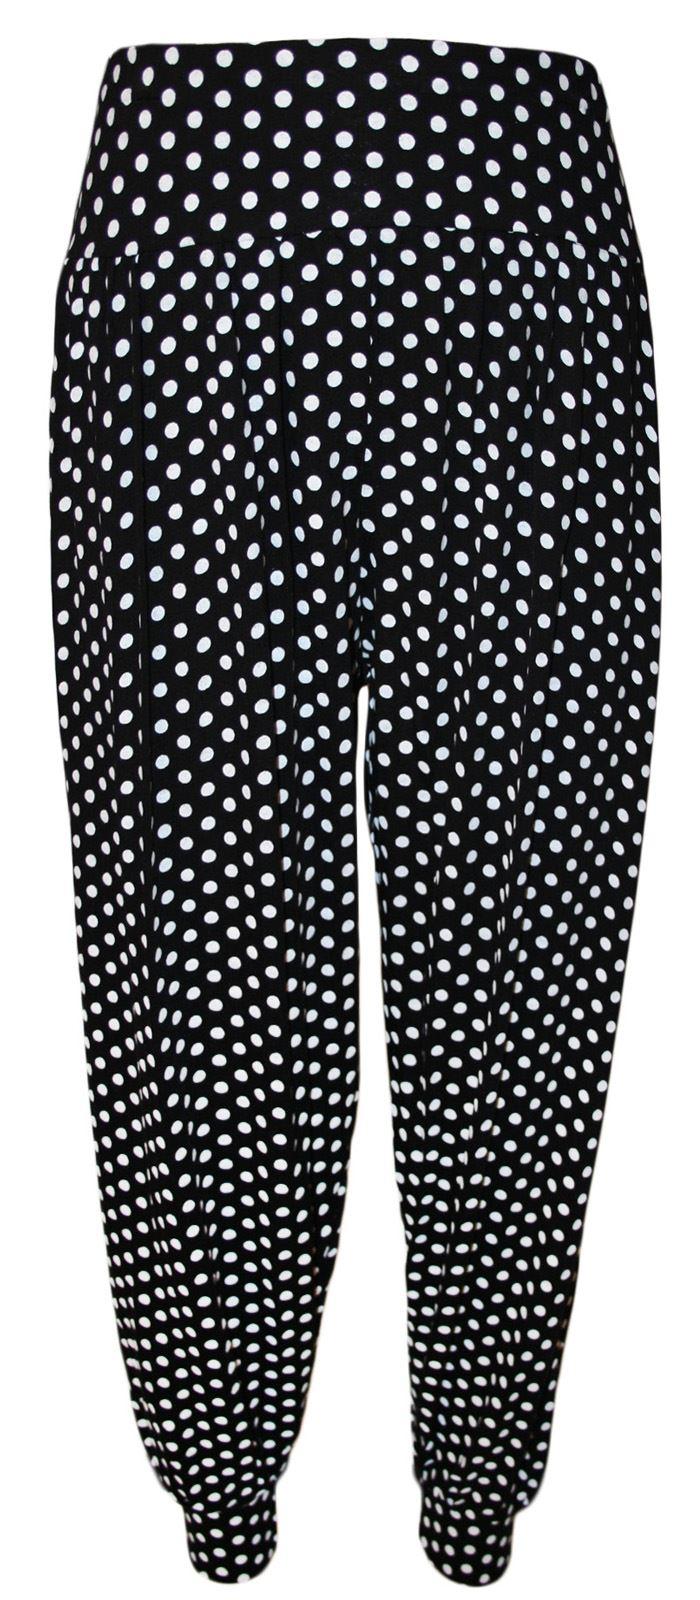 Polka-dot print Adjustable elastic waist Twin side pockets.